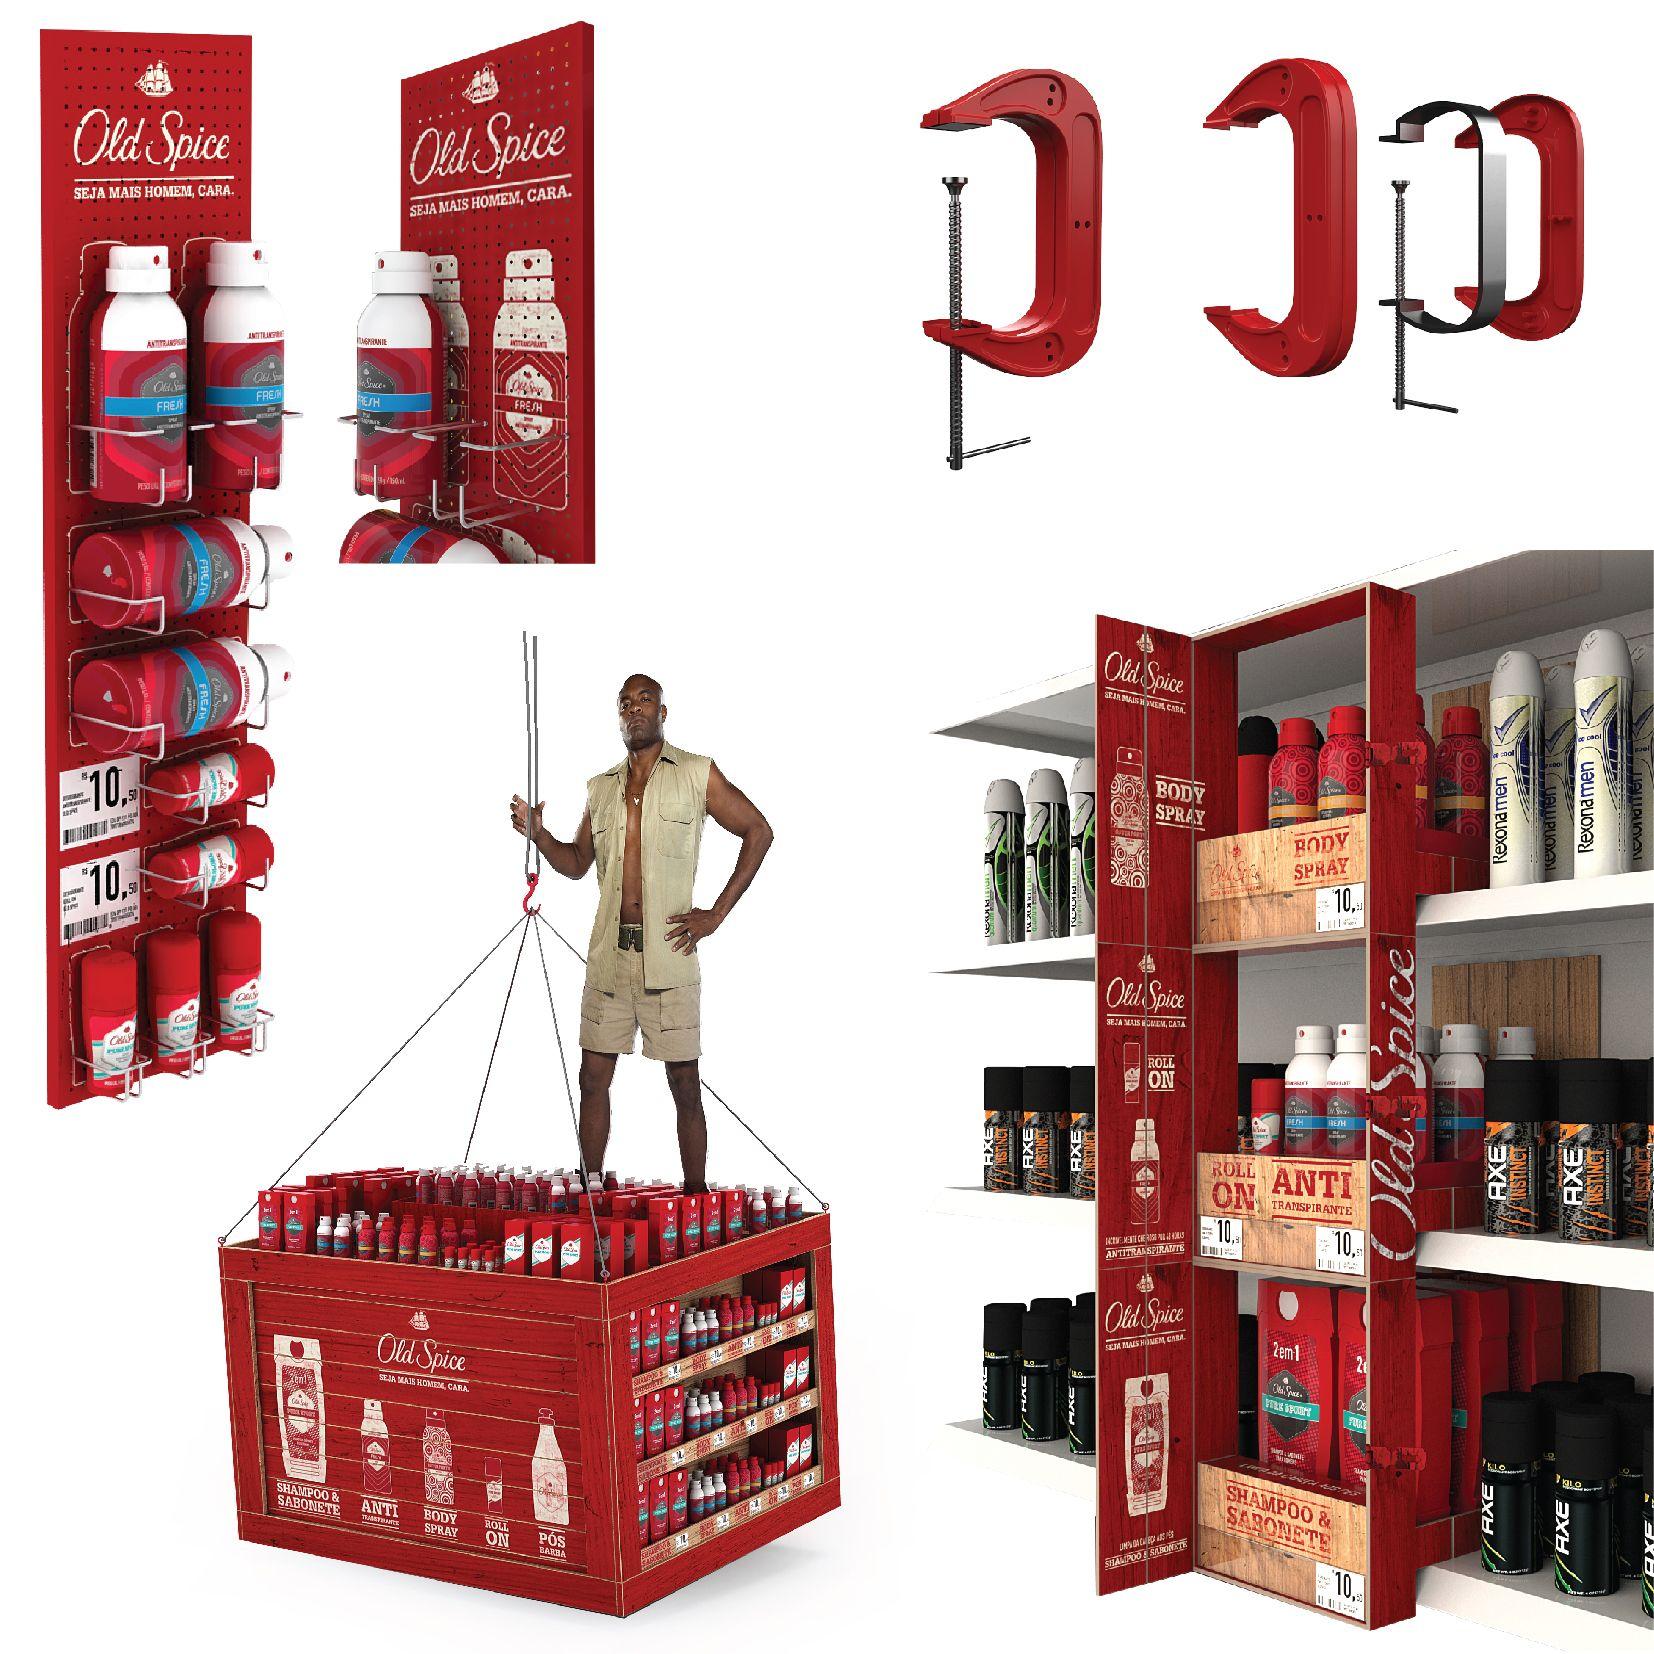 Posm design sofy posm design - Point Of Sale Design By Ricardo Pace At Coroflot Com